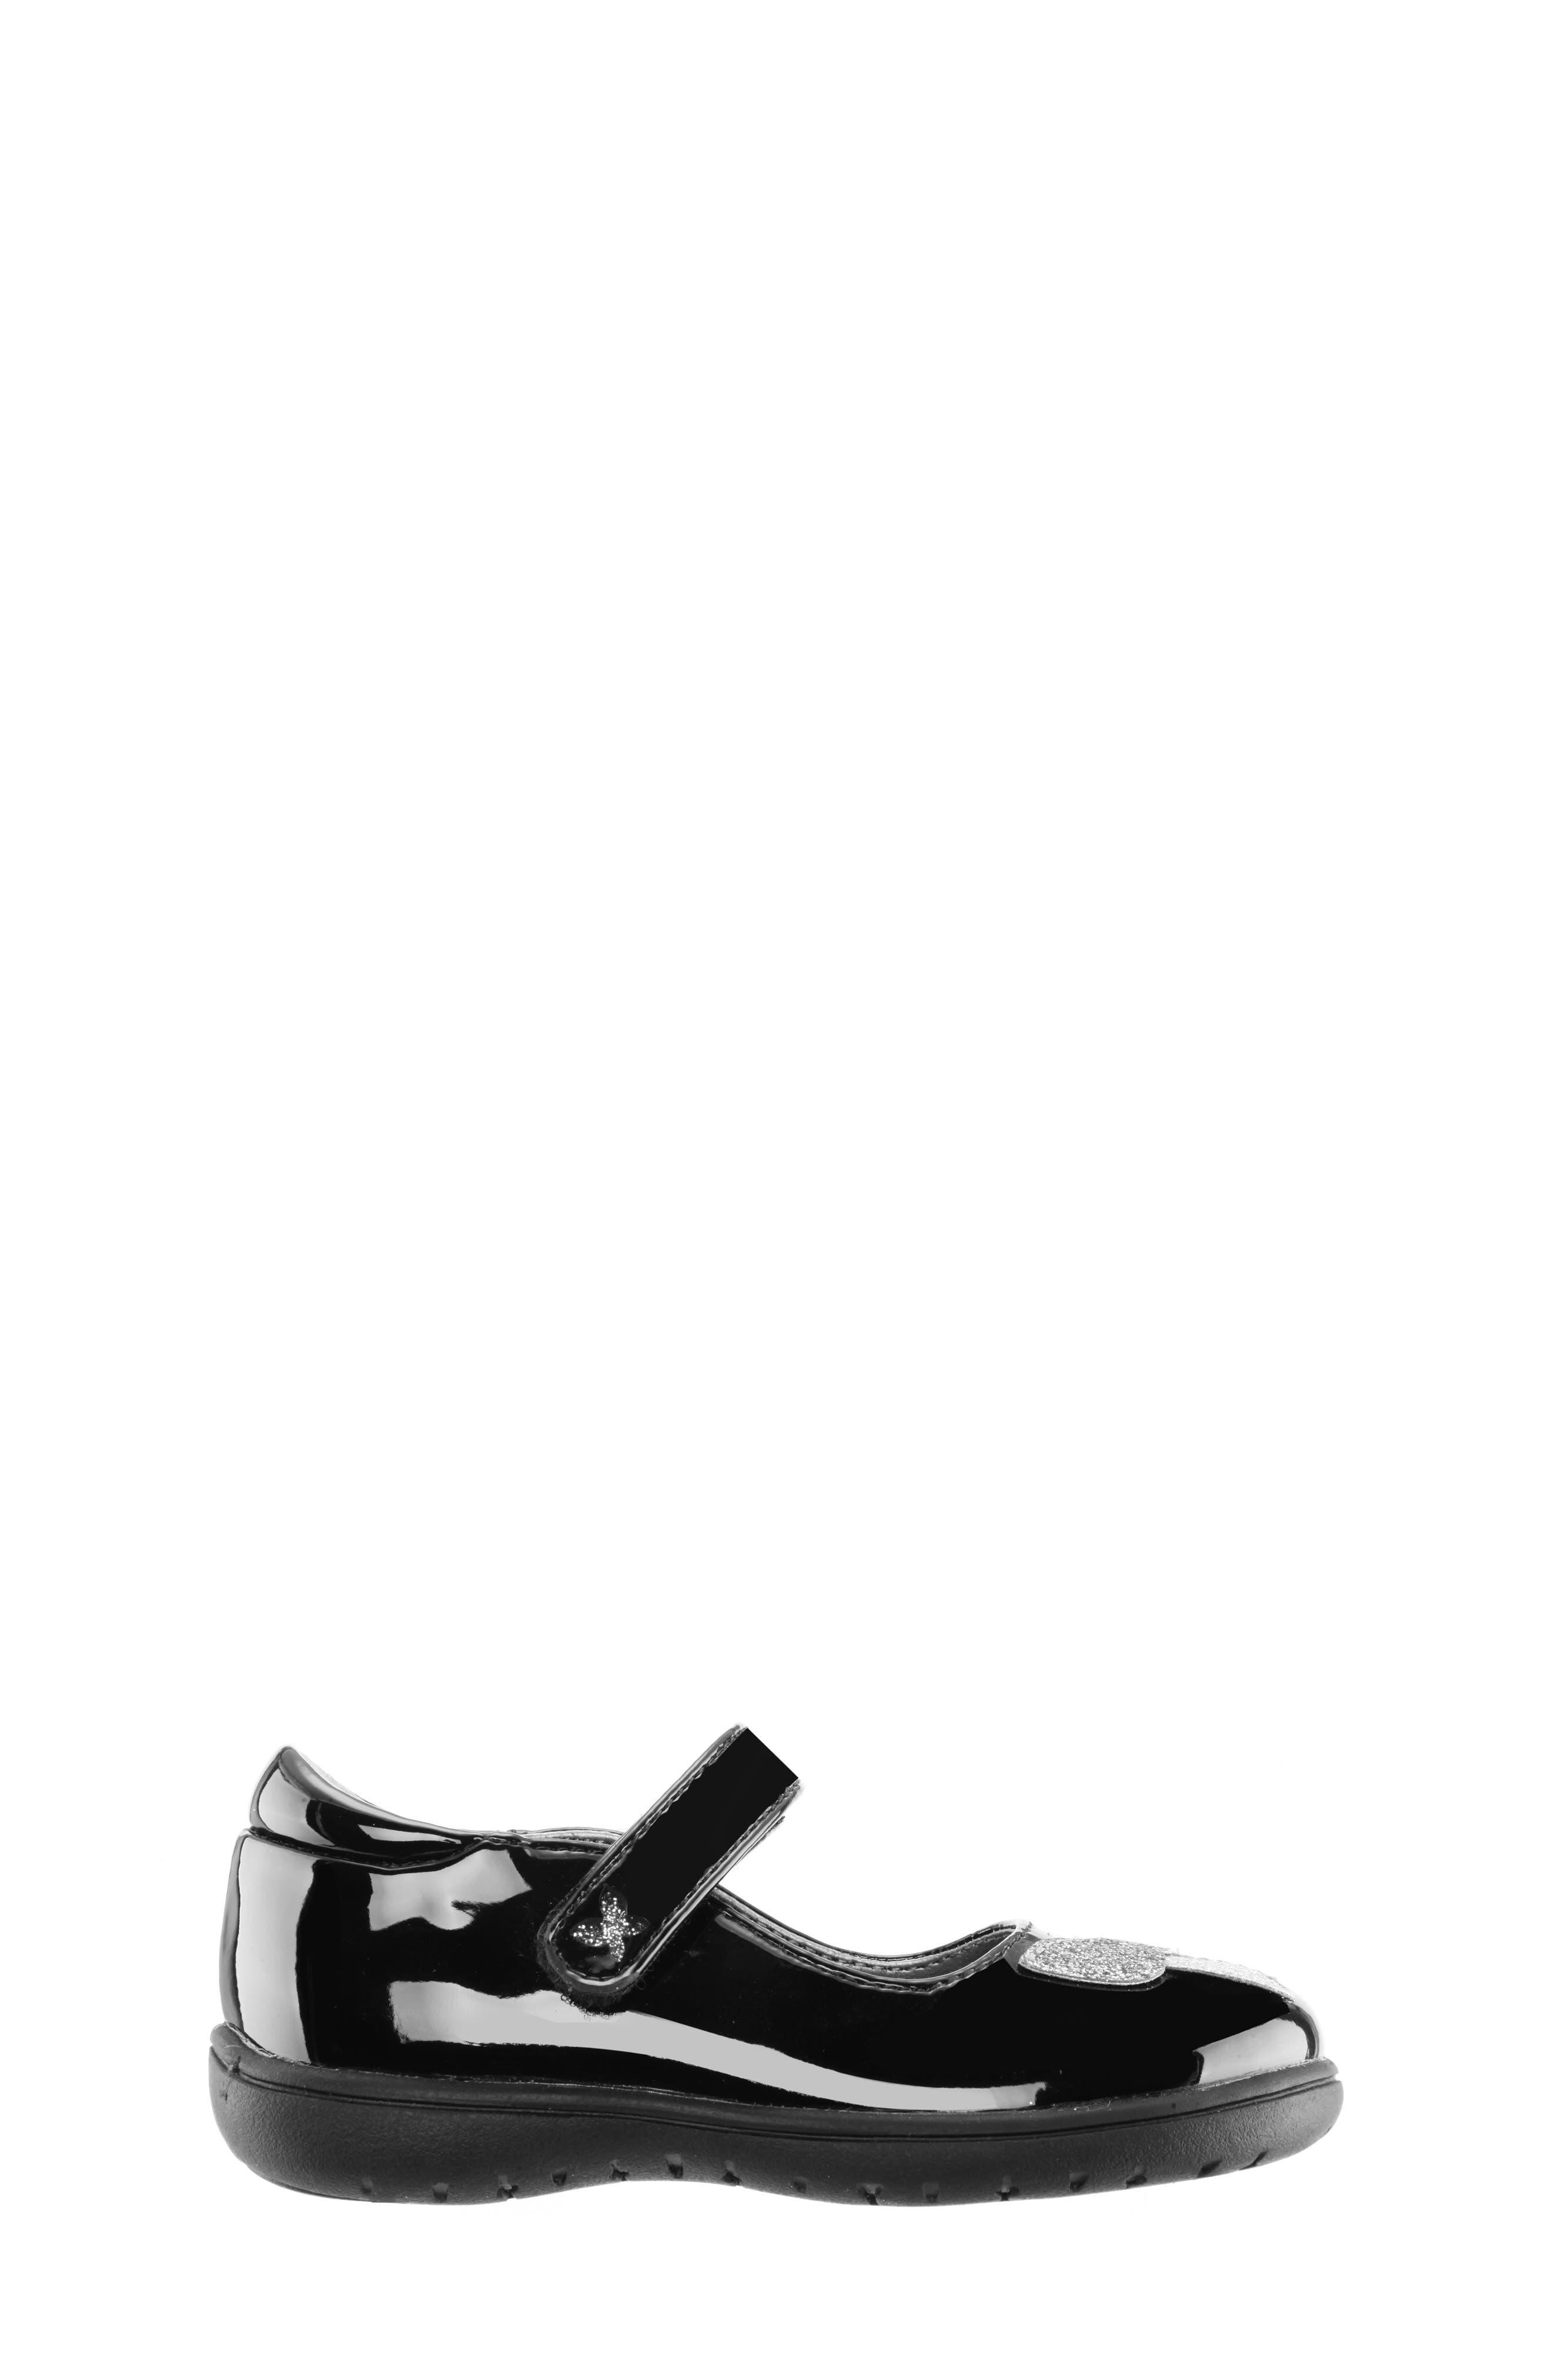 Alysha Glitter Mary Jane,                             Alternate thumbnail 3, color,                             BLACK/ PATENT GLITTER